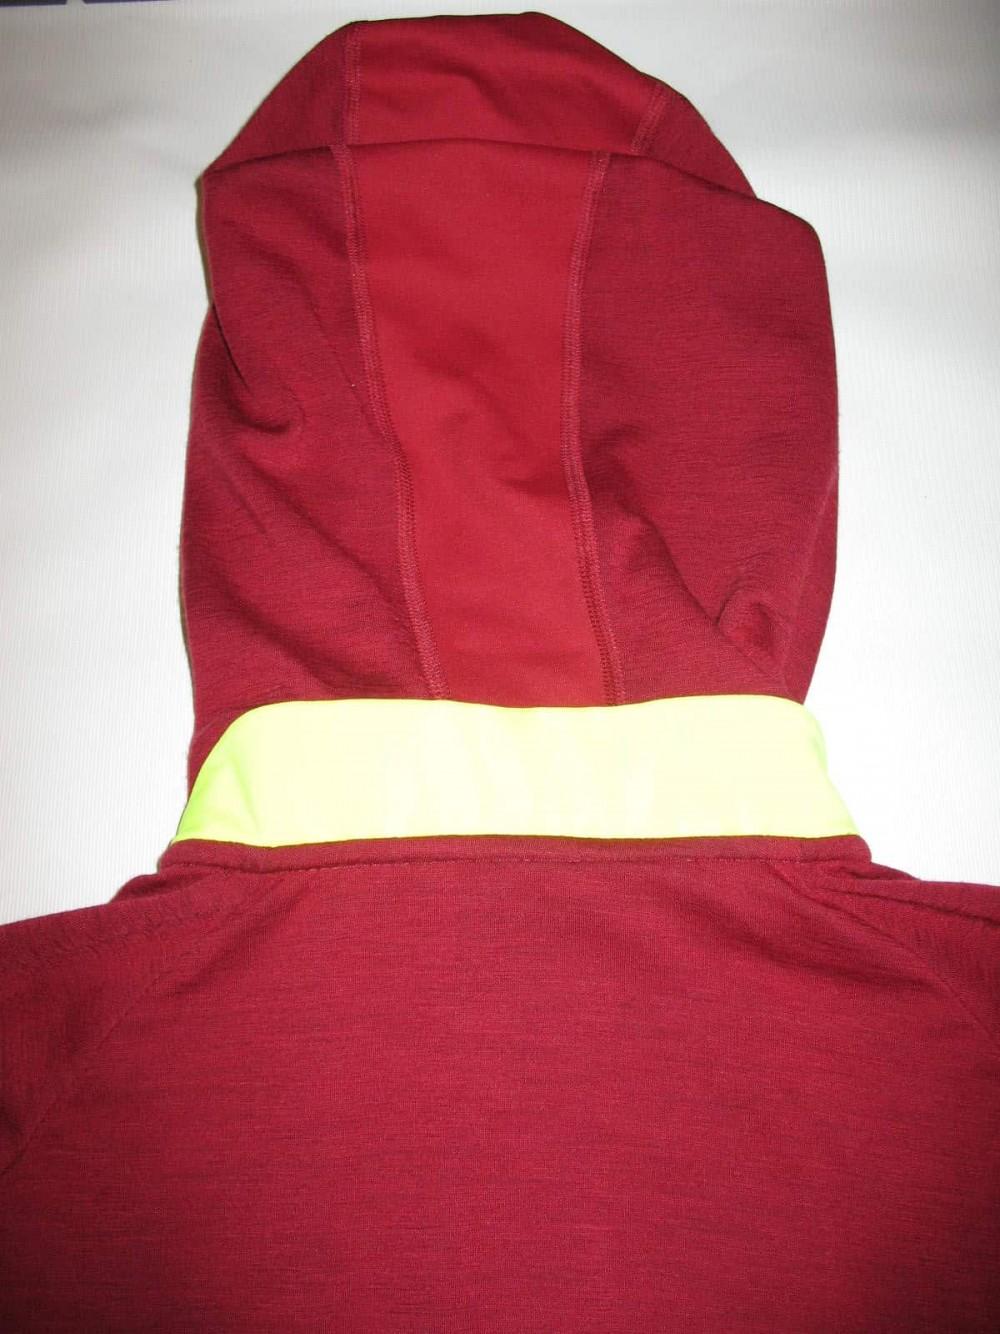 Кофта GORE running wear hooded running jacket (размер XXL) - 14